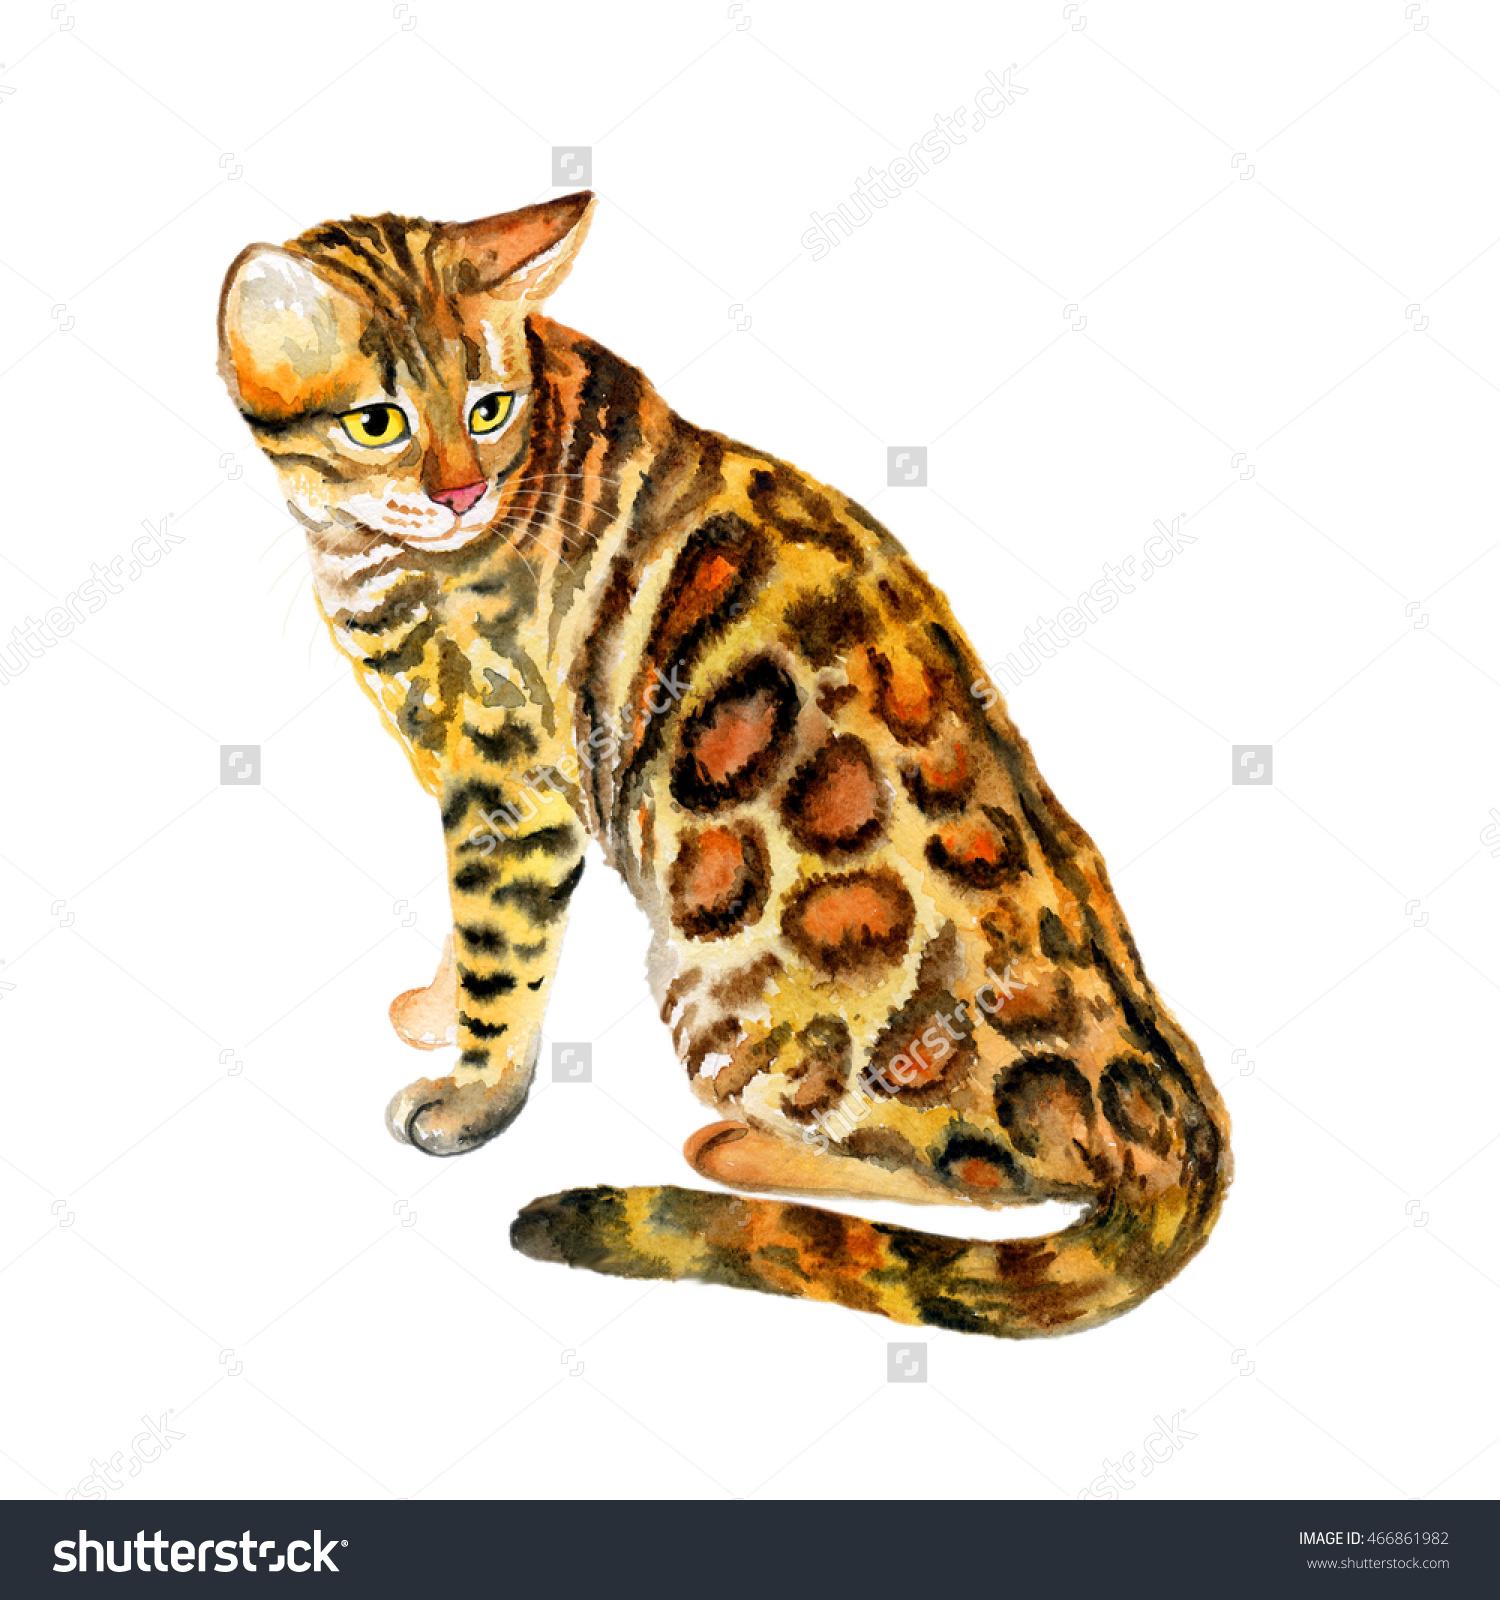 Bengal Cat clipart #2, Download drawings